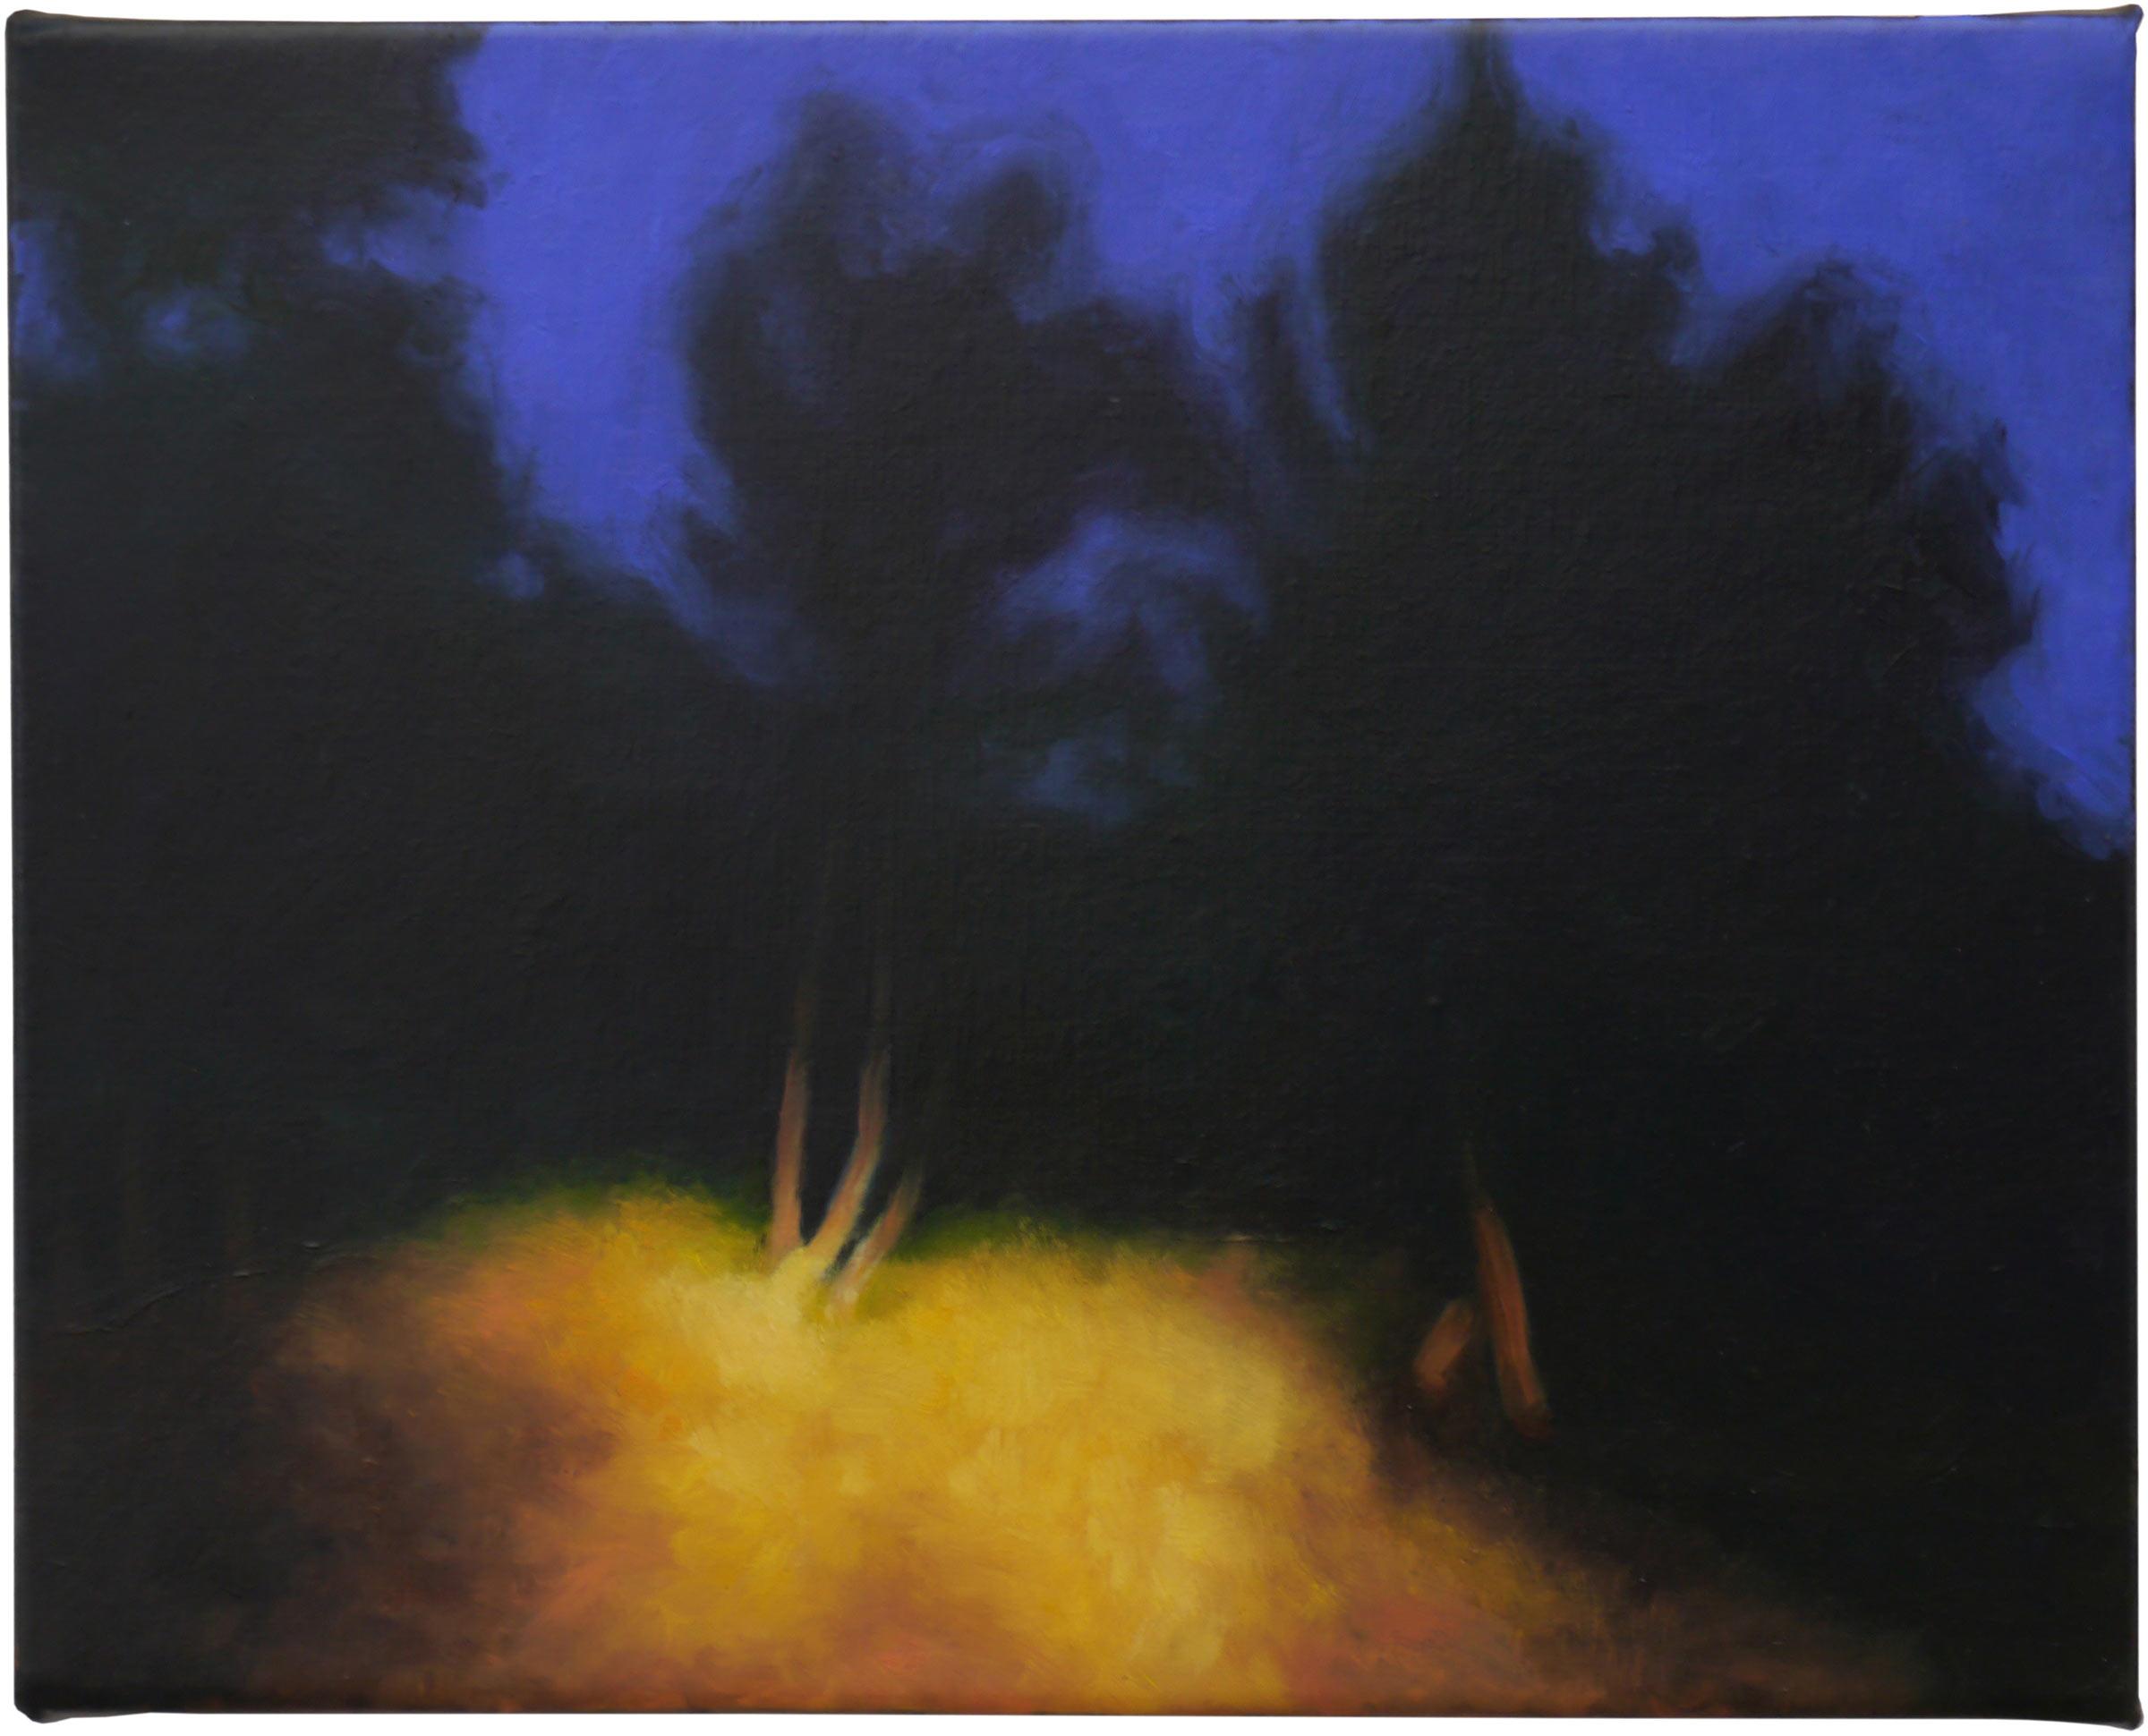 The shadows beyond 5, oil on linen, 30cm x 24cm, 2021